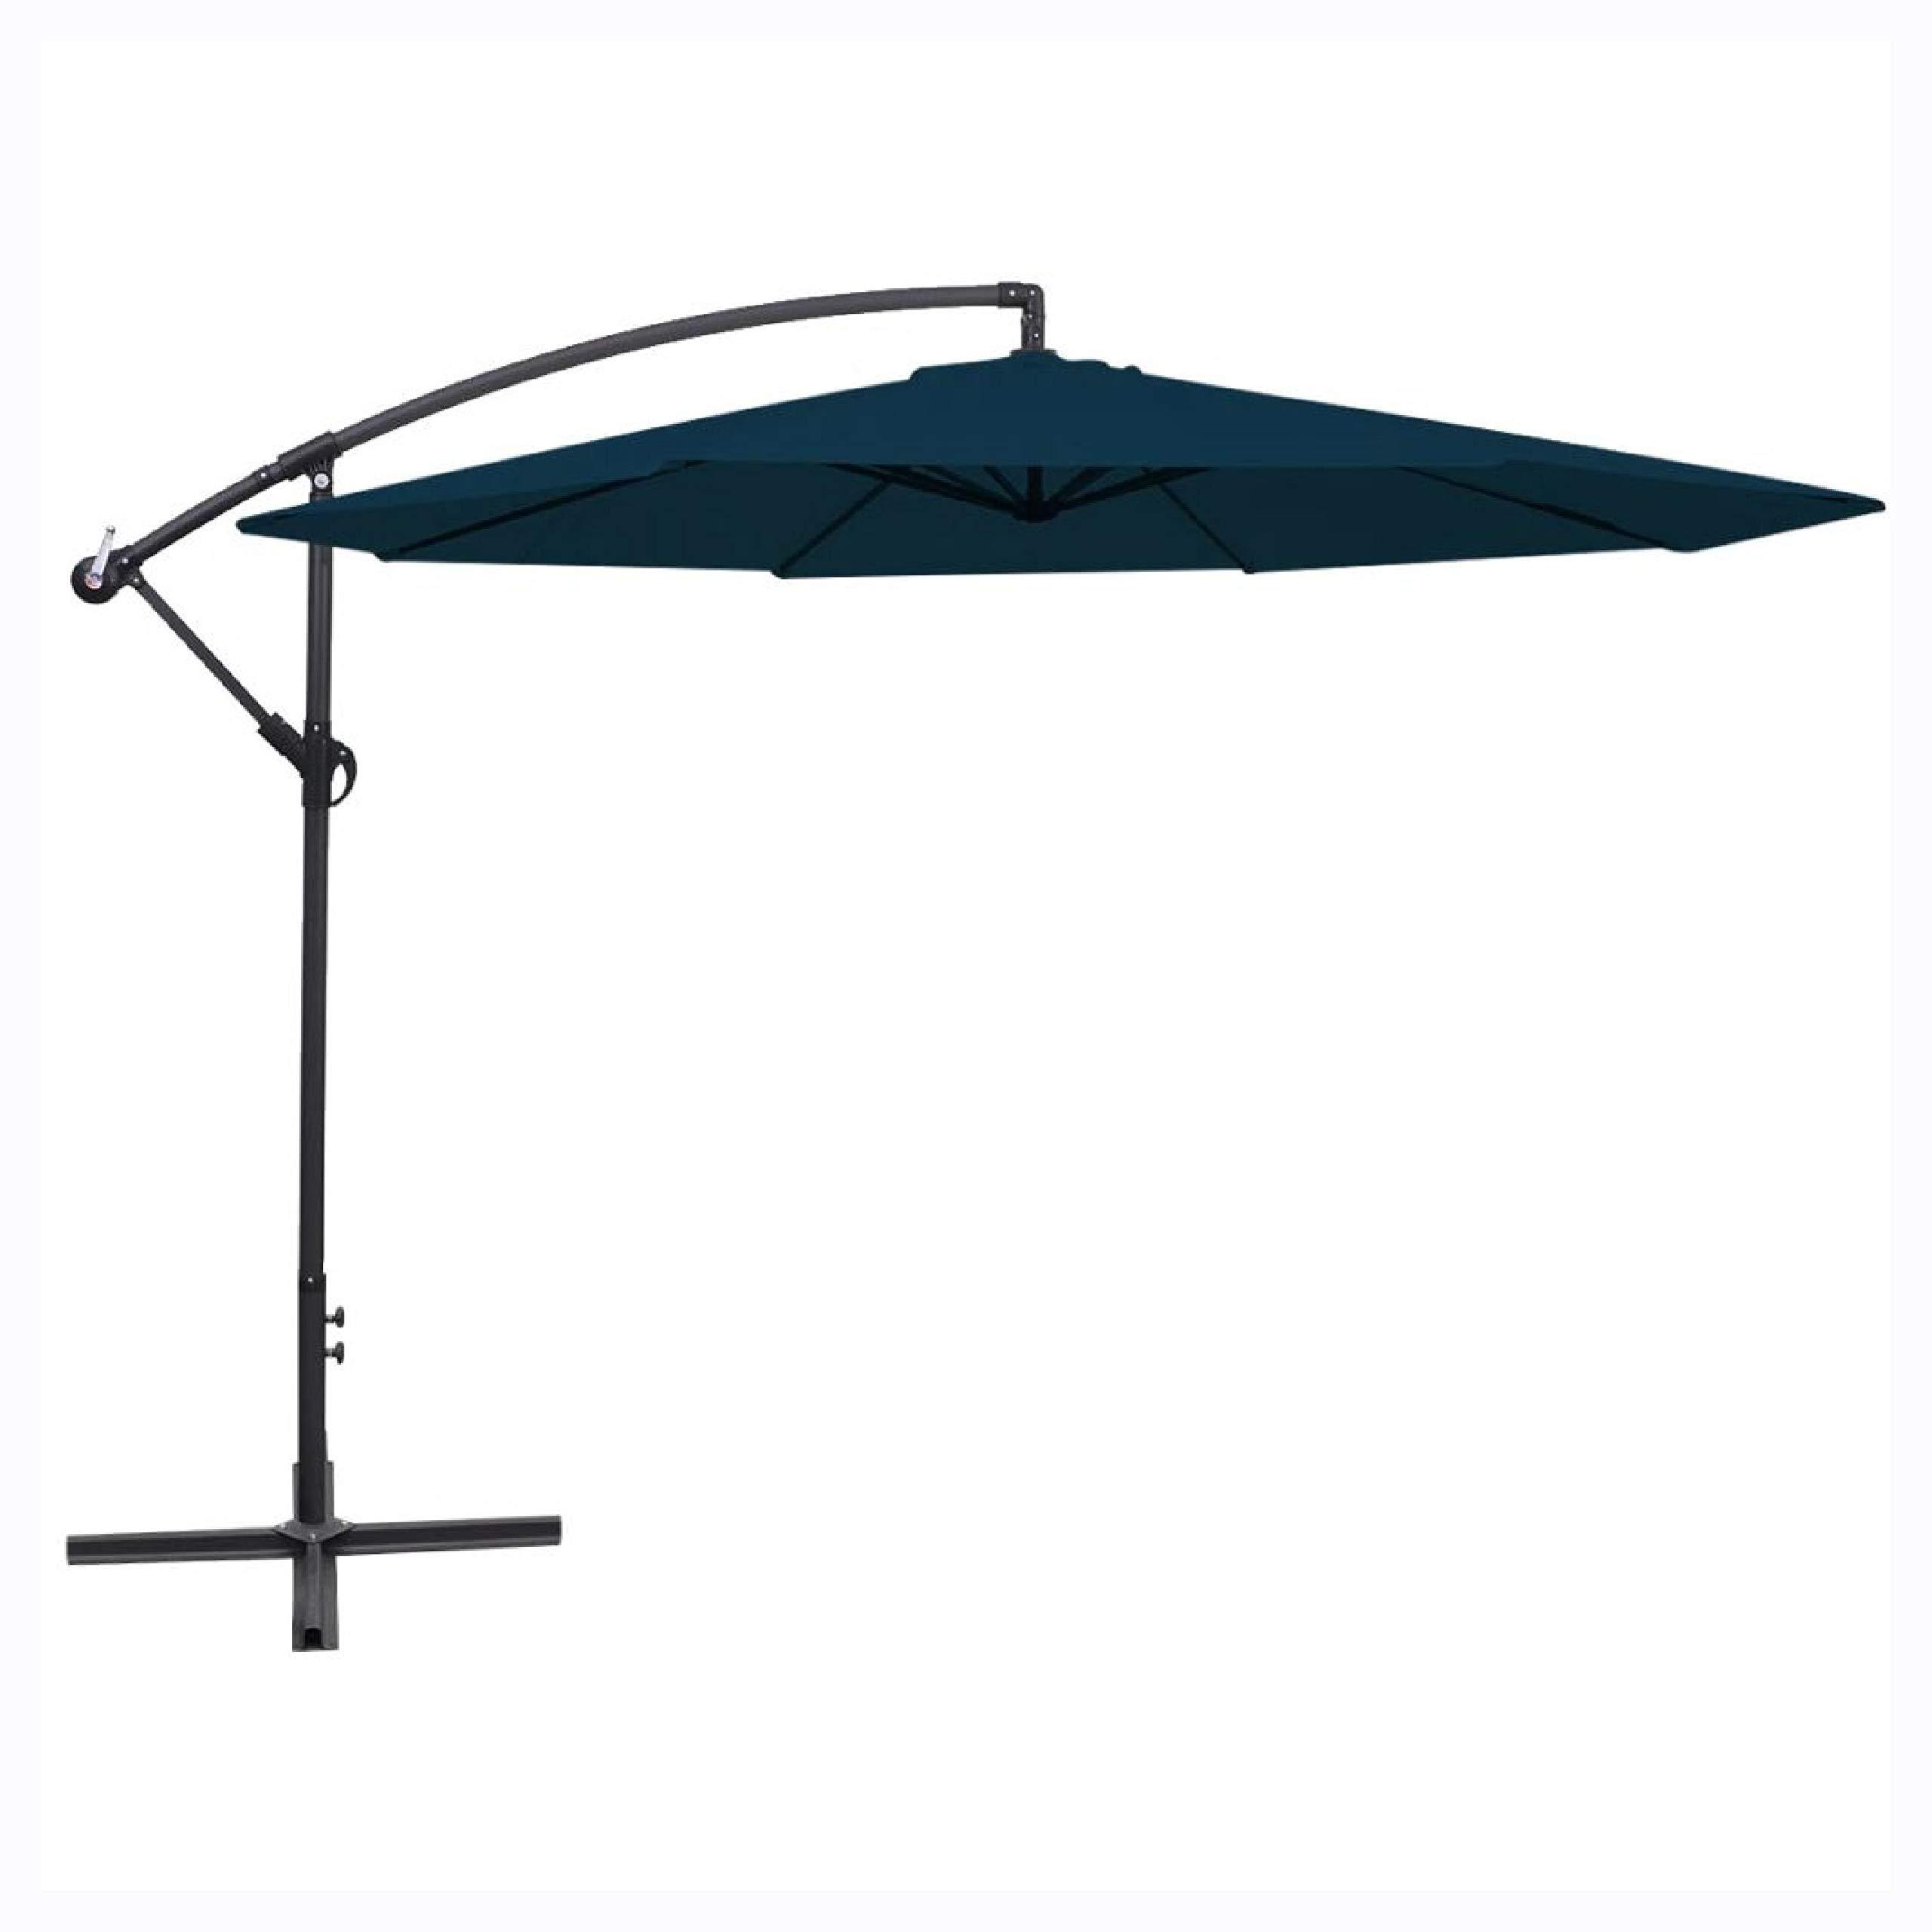 Outdoor Umbrellas & Sunshades, Cantilever Umbrella 137.8'' Blue by K&A Company